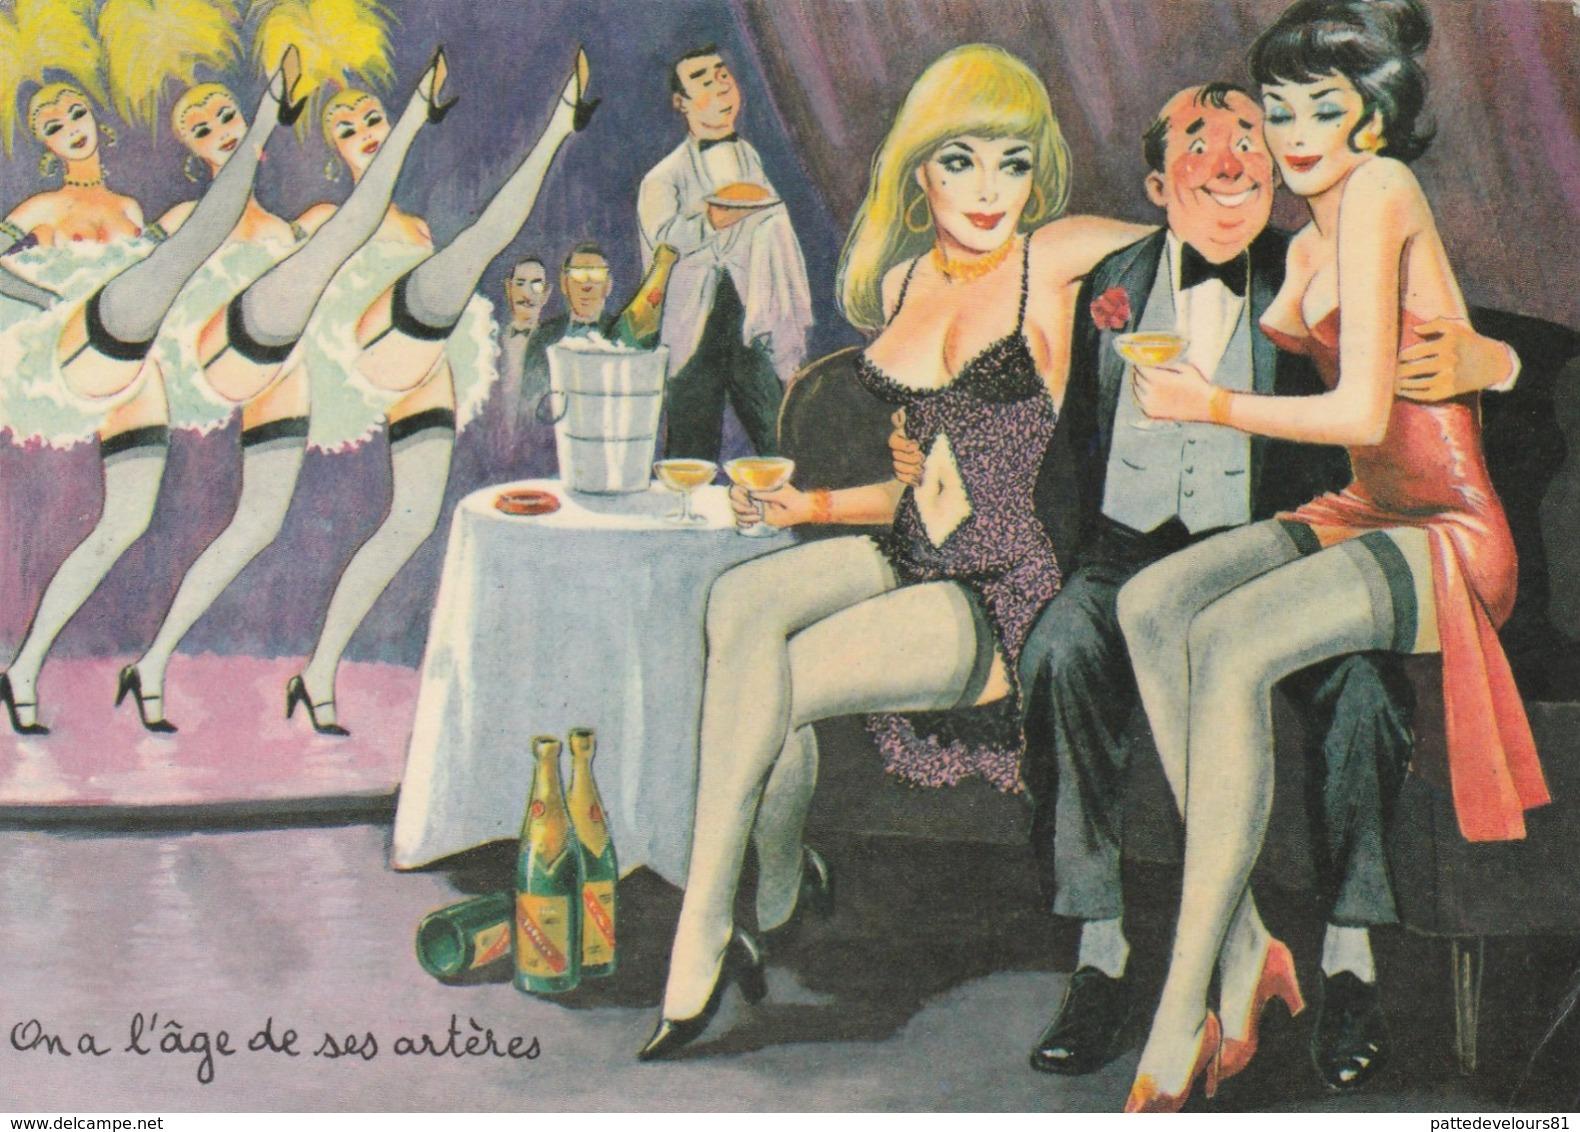 CPSM Pin-up Sexy Glamour Bas Entraîneuse Prostituée French Cancan Pigeon Illustrateur L. CARRIERE N° 50354 (2 Scans) - Carrière, Louis